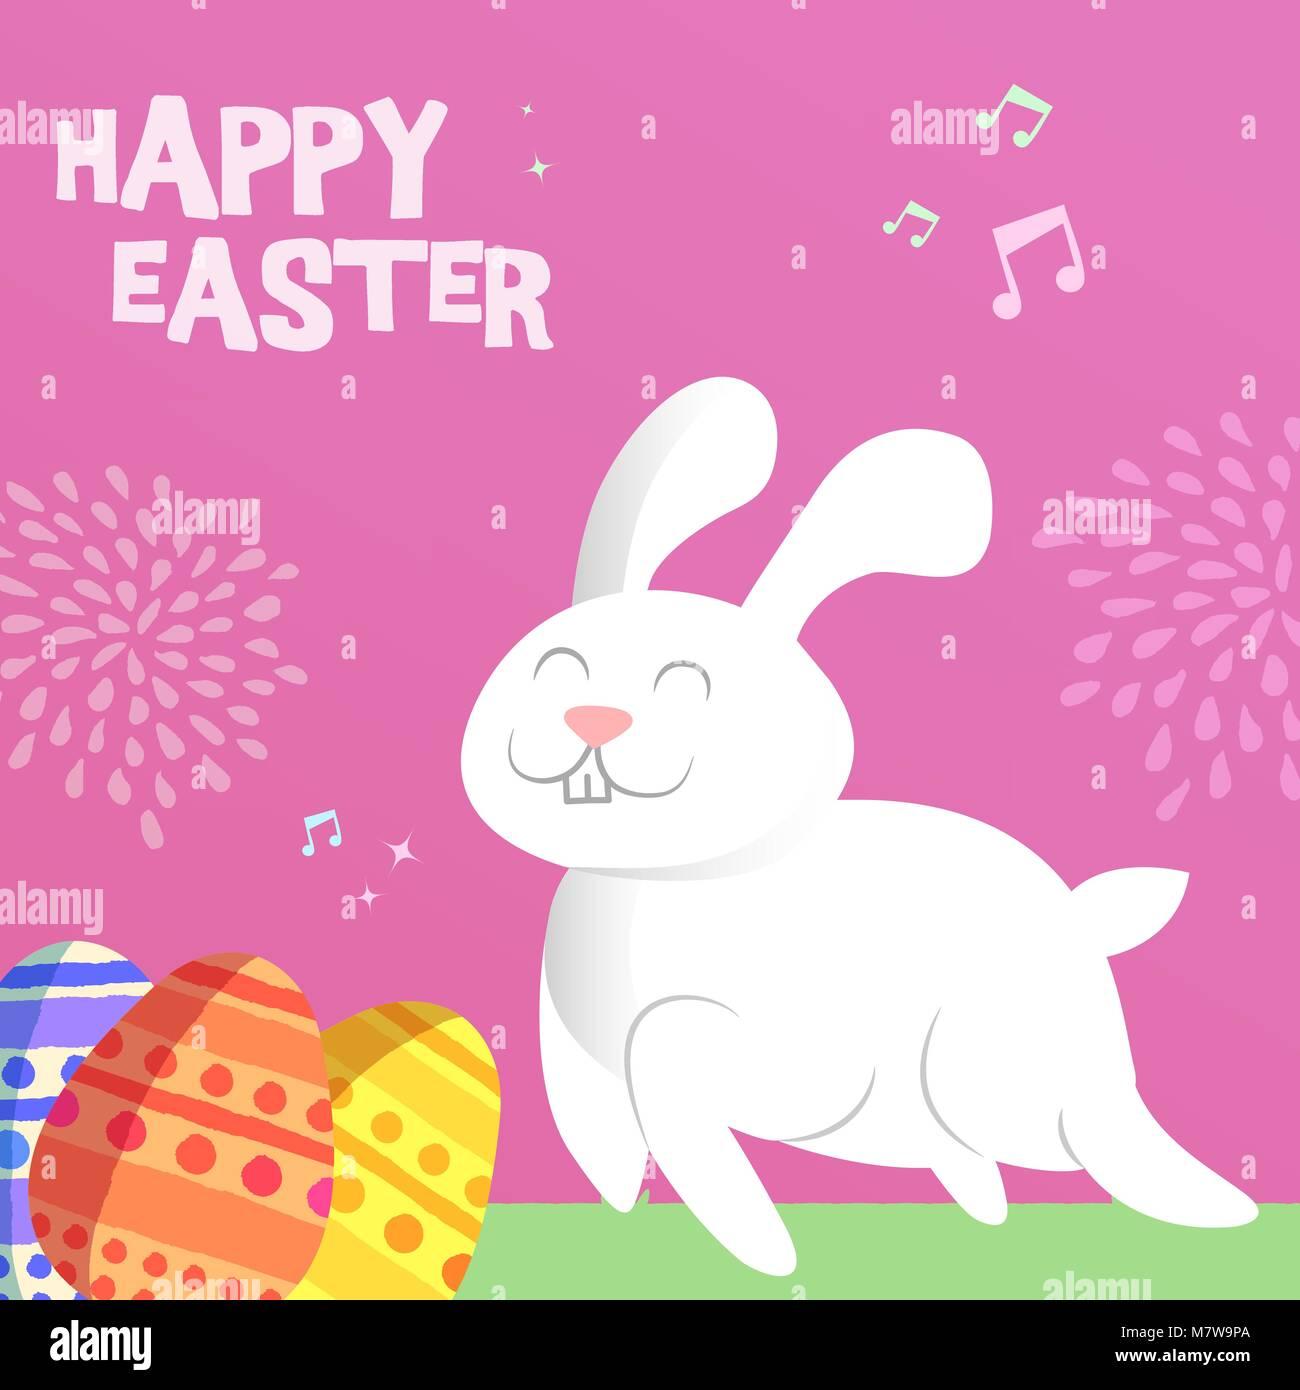 Frohe Ostern Grußkarte Illustration Für Frühlingsfest Veranstaltung